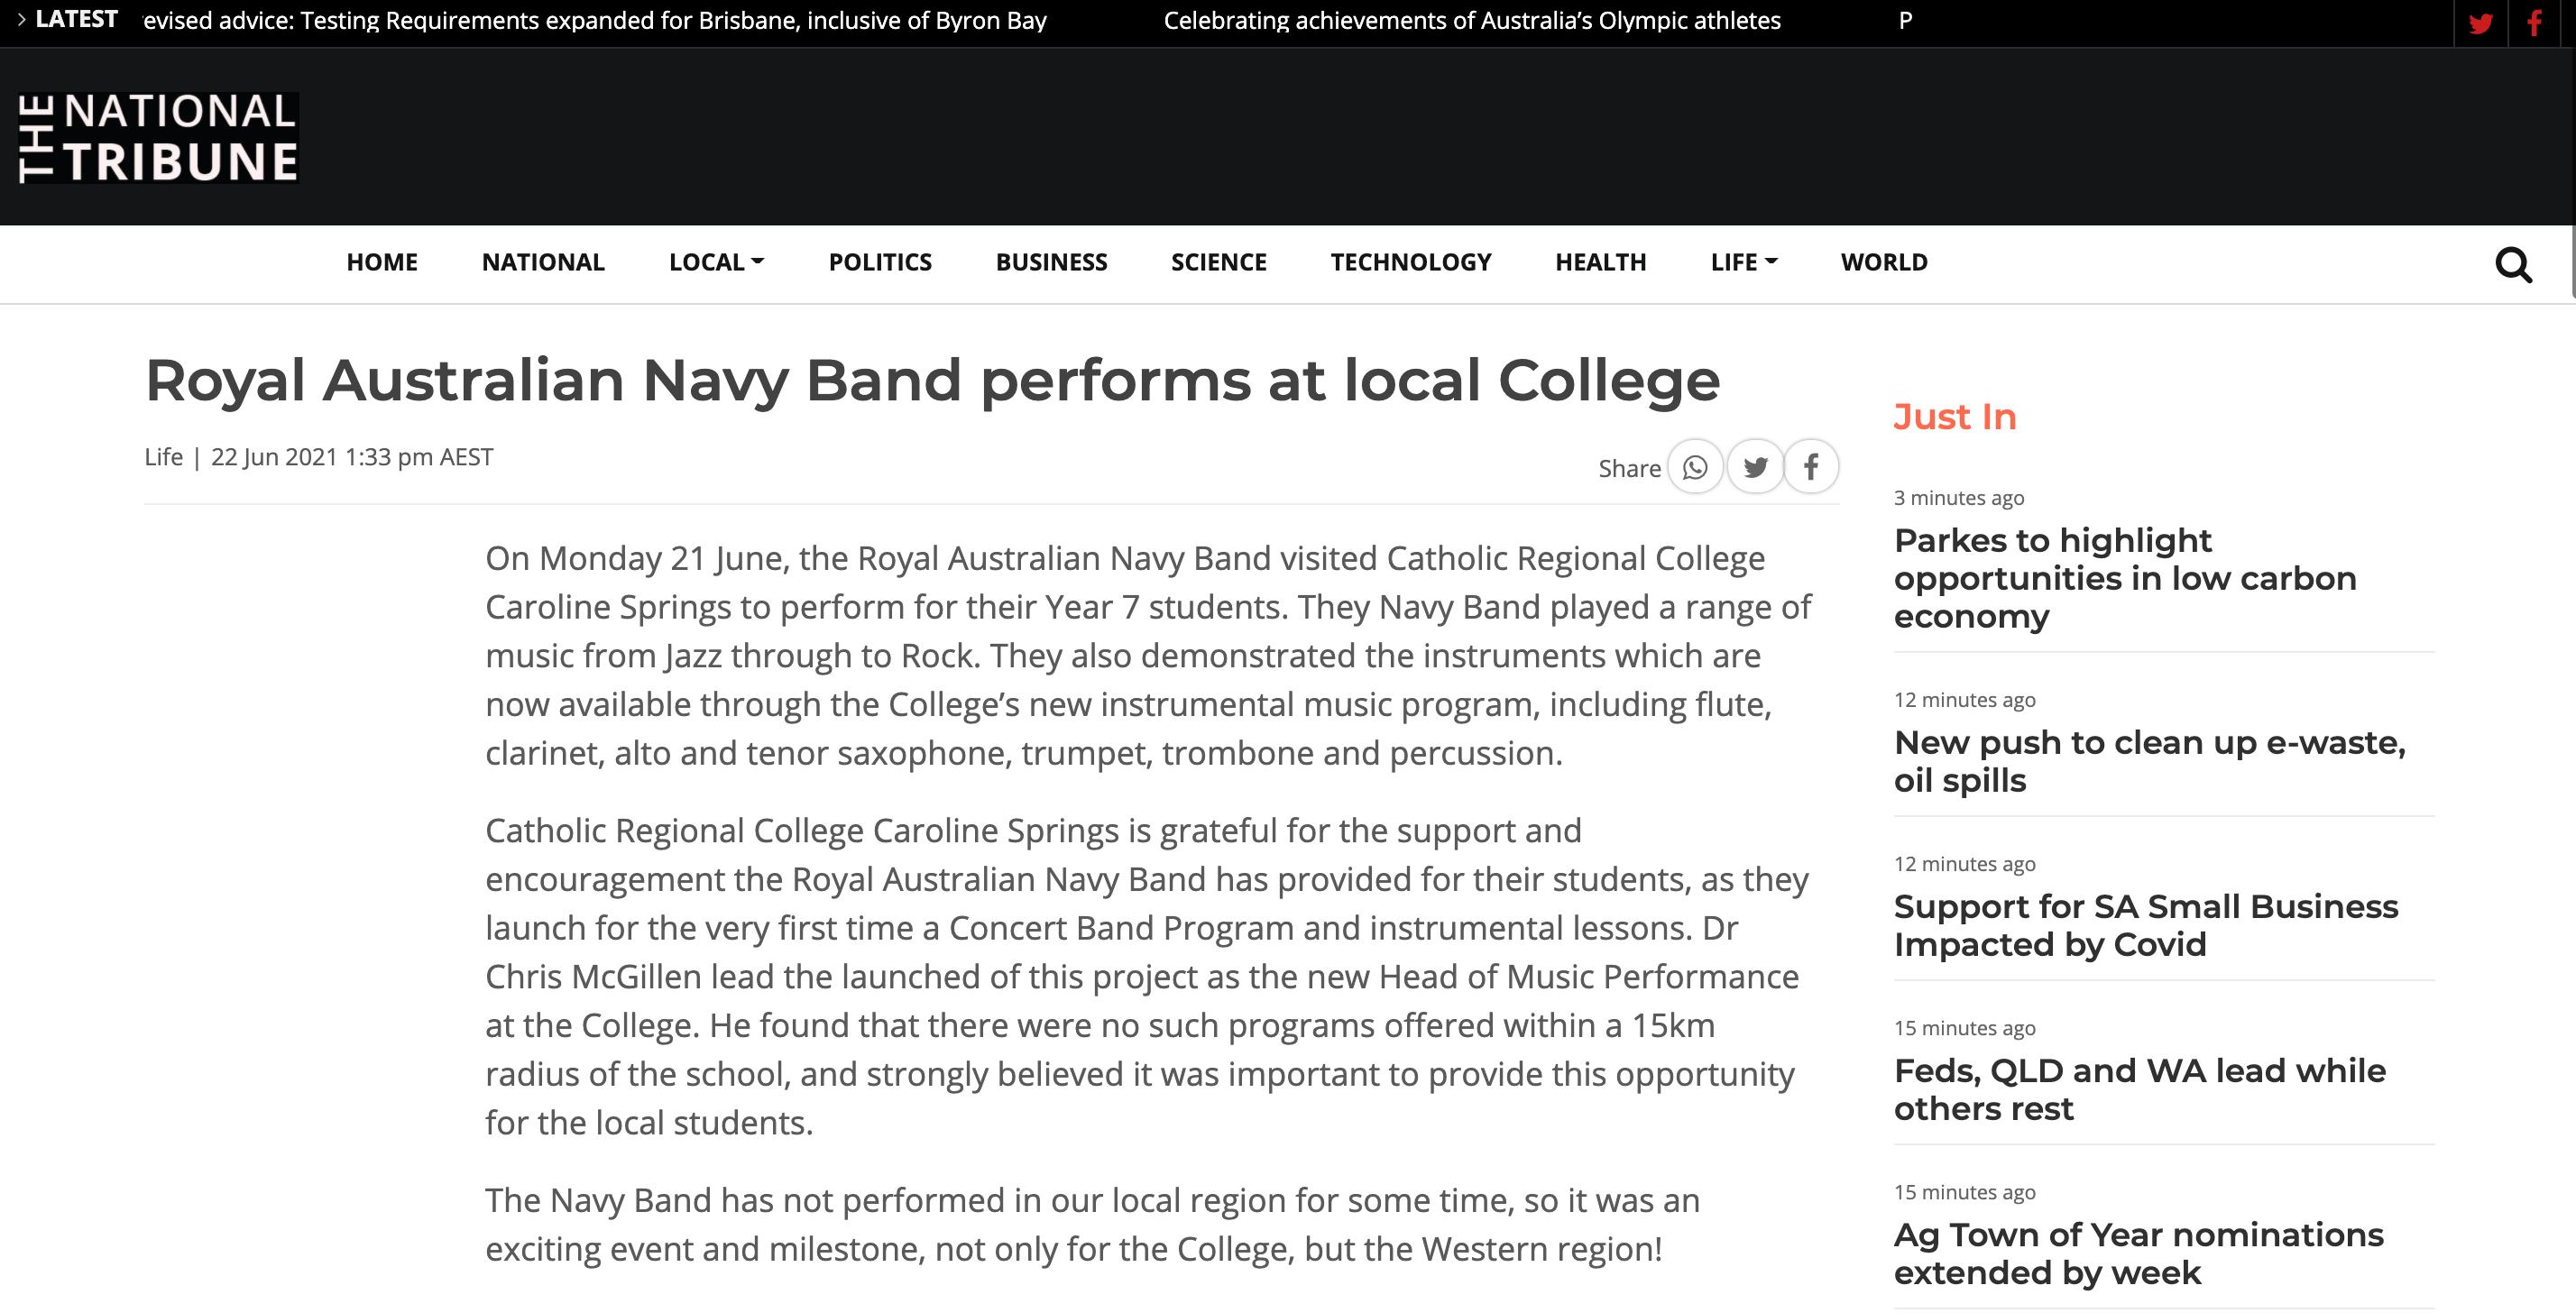 The National Tribune - CRCCS